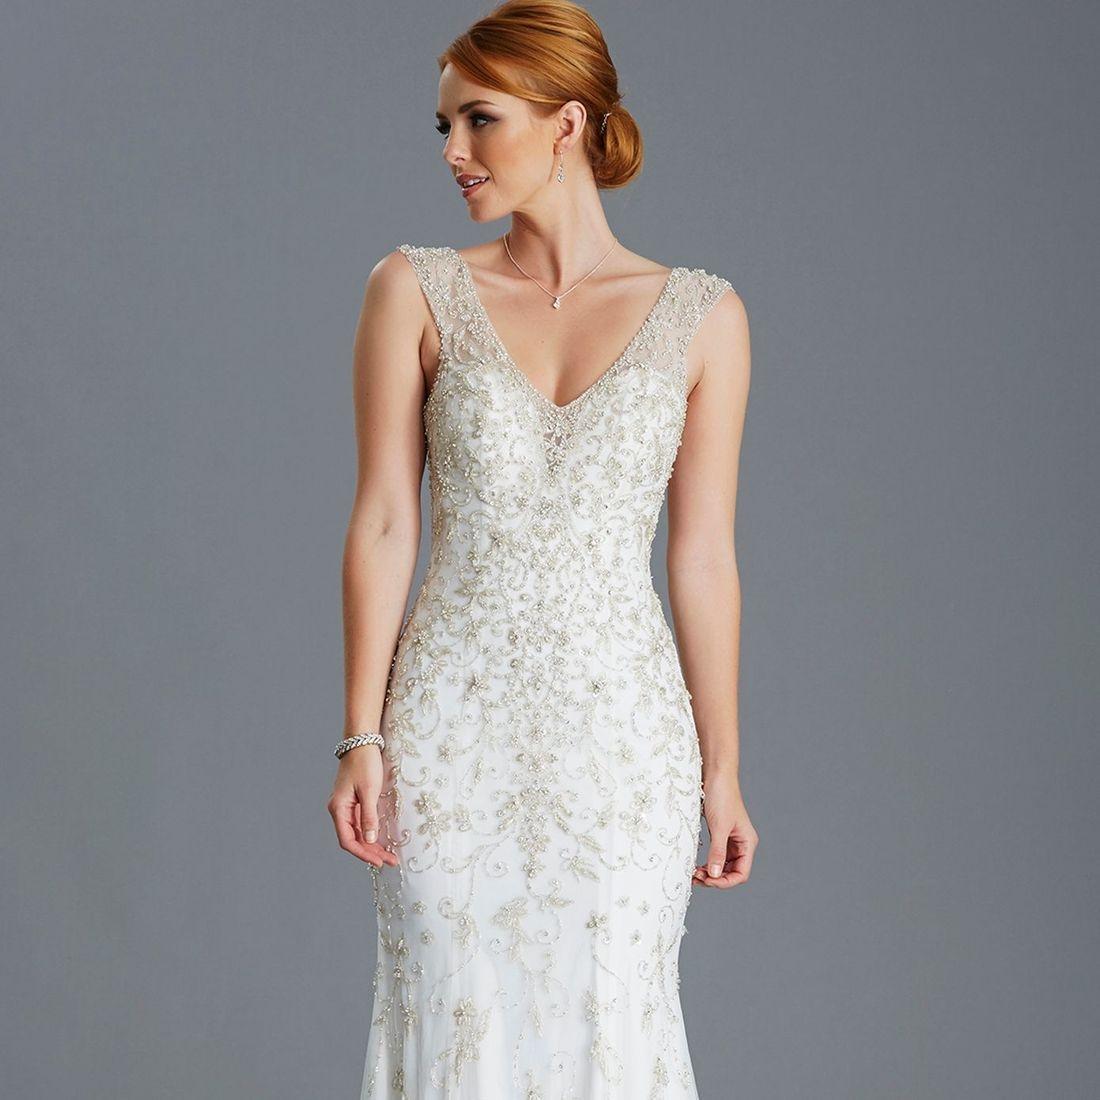 Encrusted slimfit wedding dress